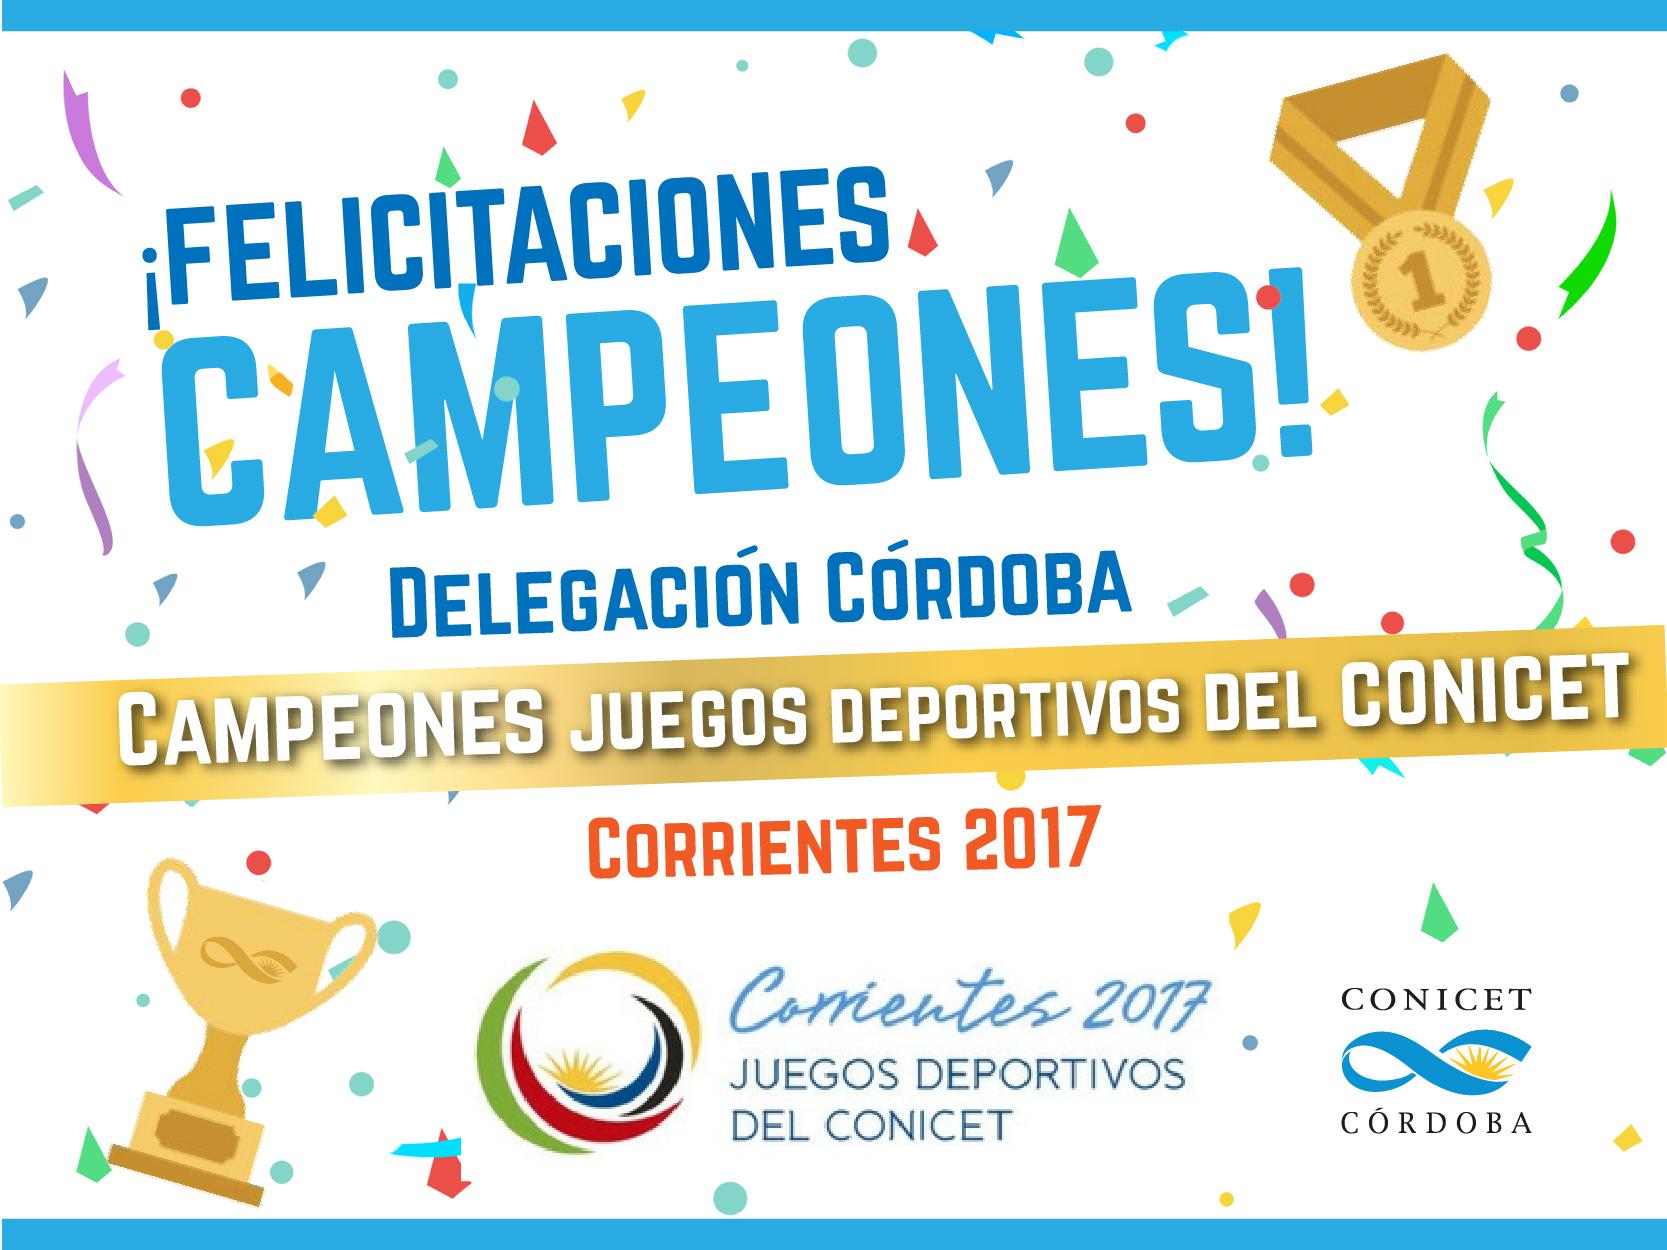 Campeones corrientes 2017-01